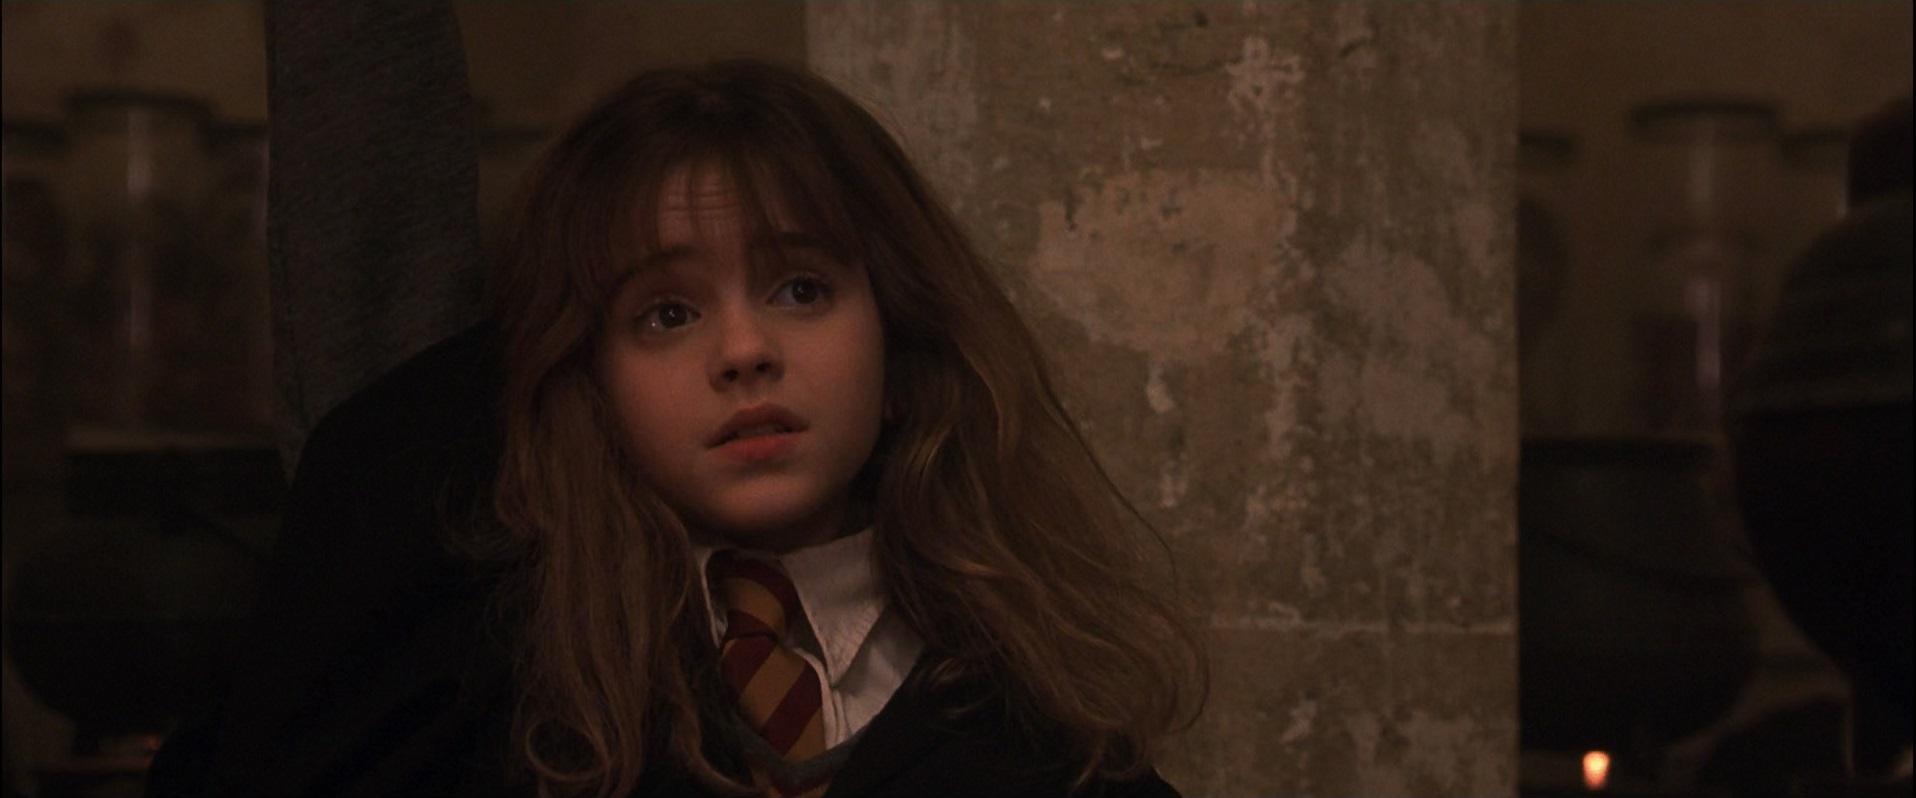 Potterish.com [Year 18] :: Harry Potter, The Ickabog, Fantastic Beasts, JK Rowling, Daniel, Emma & Rupert Severus Snape chose the wrong occupation